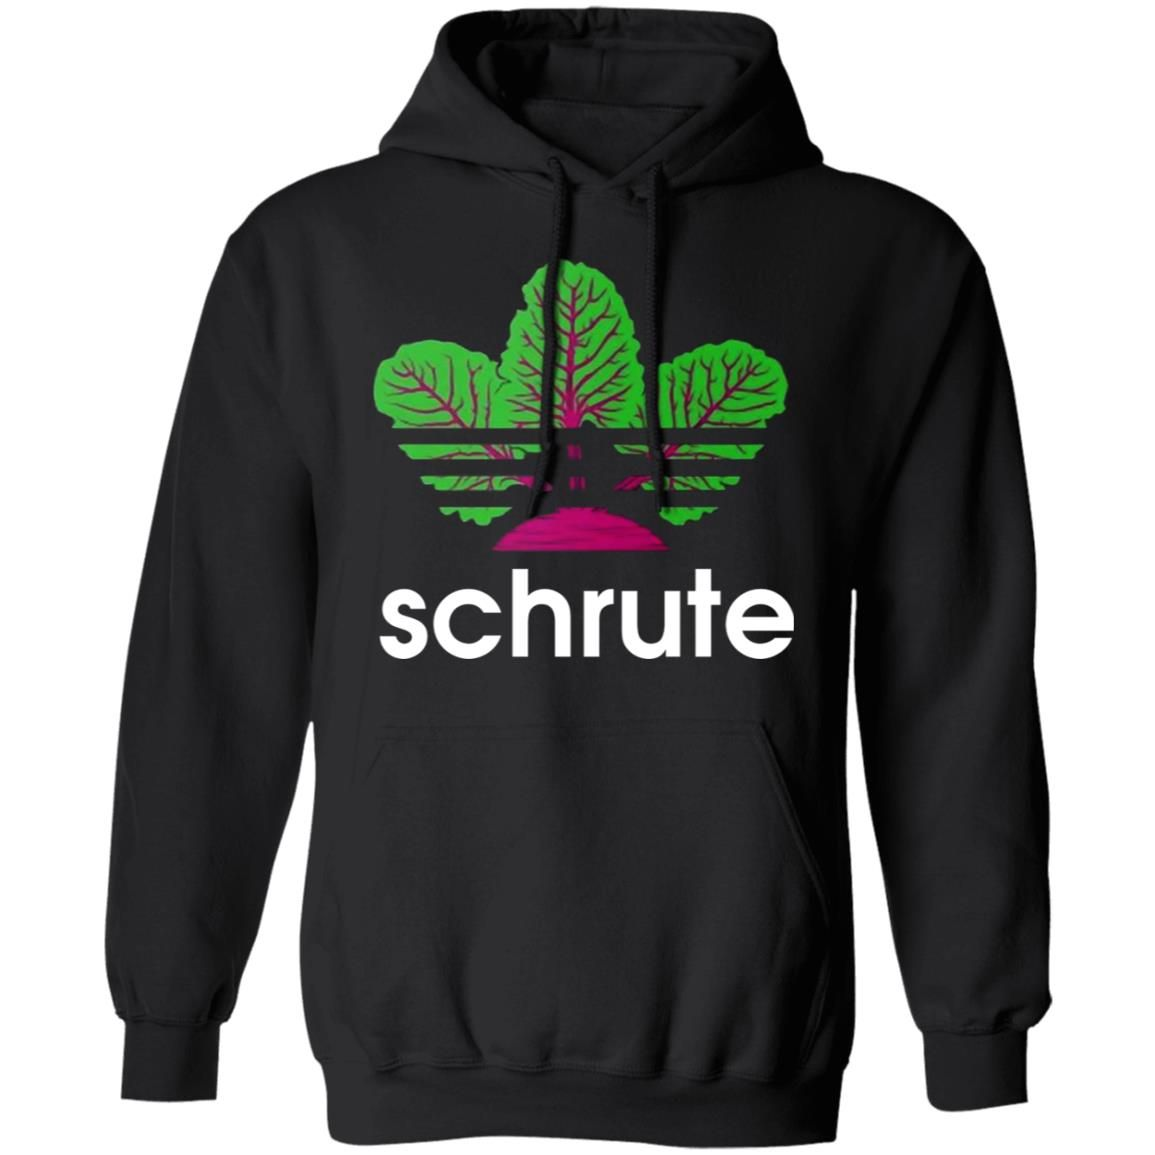 Predownload: Dwight Schrute Schrute Farms Adidas Shirt T Shirt Hoodie Tank Top Sweatshirt Adidas Shirt Hoodies T Shirts For Women [ 1155 x 1155 Pixel ]